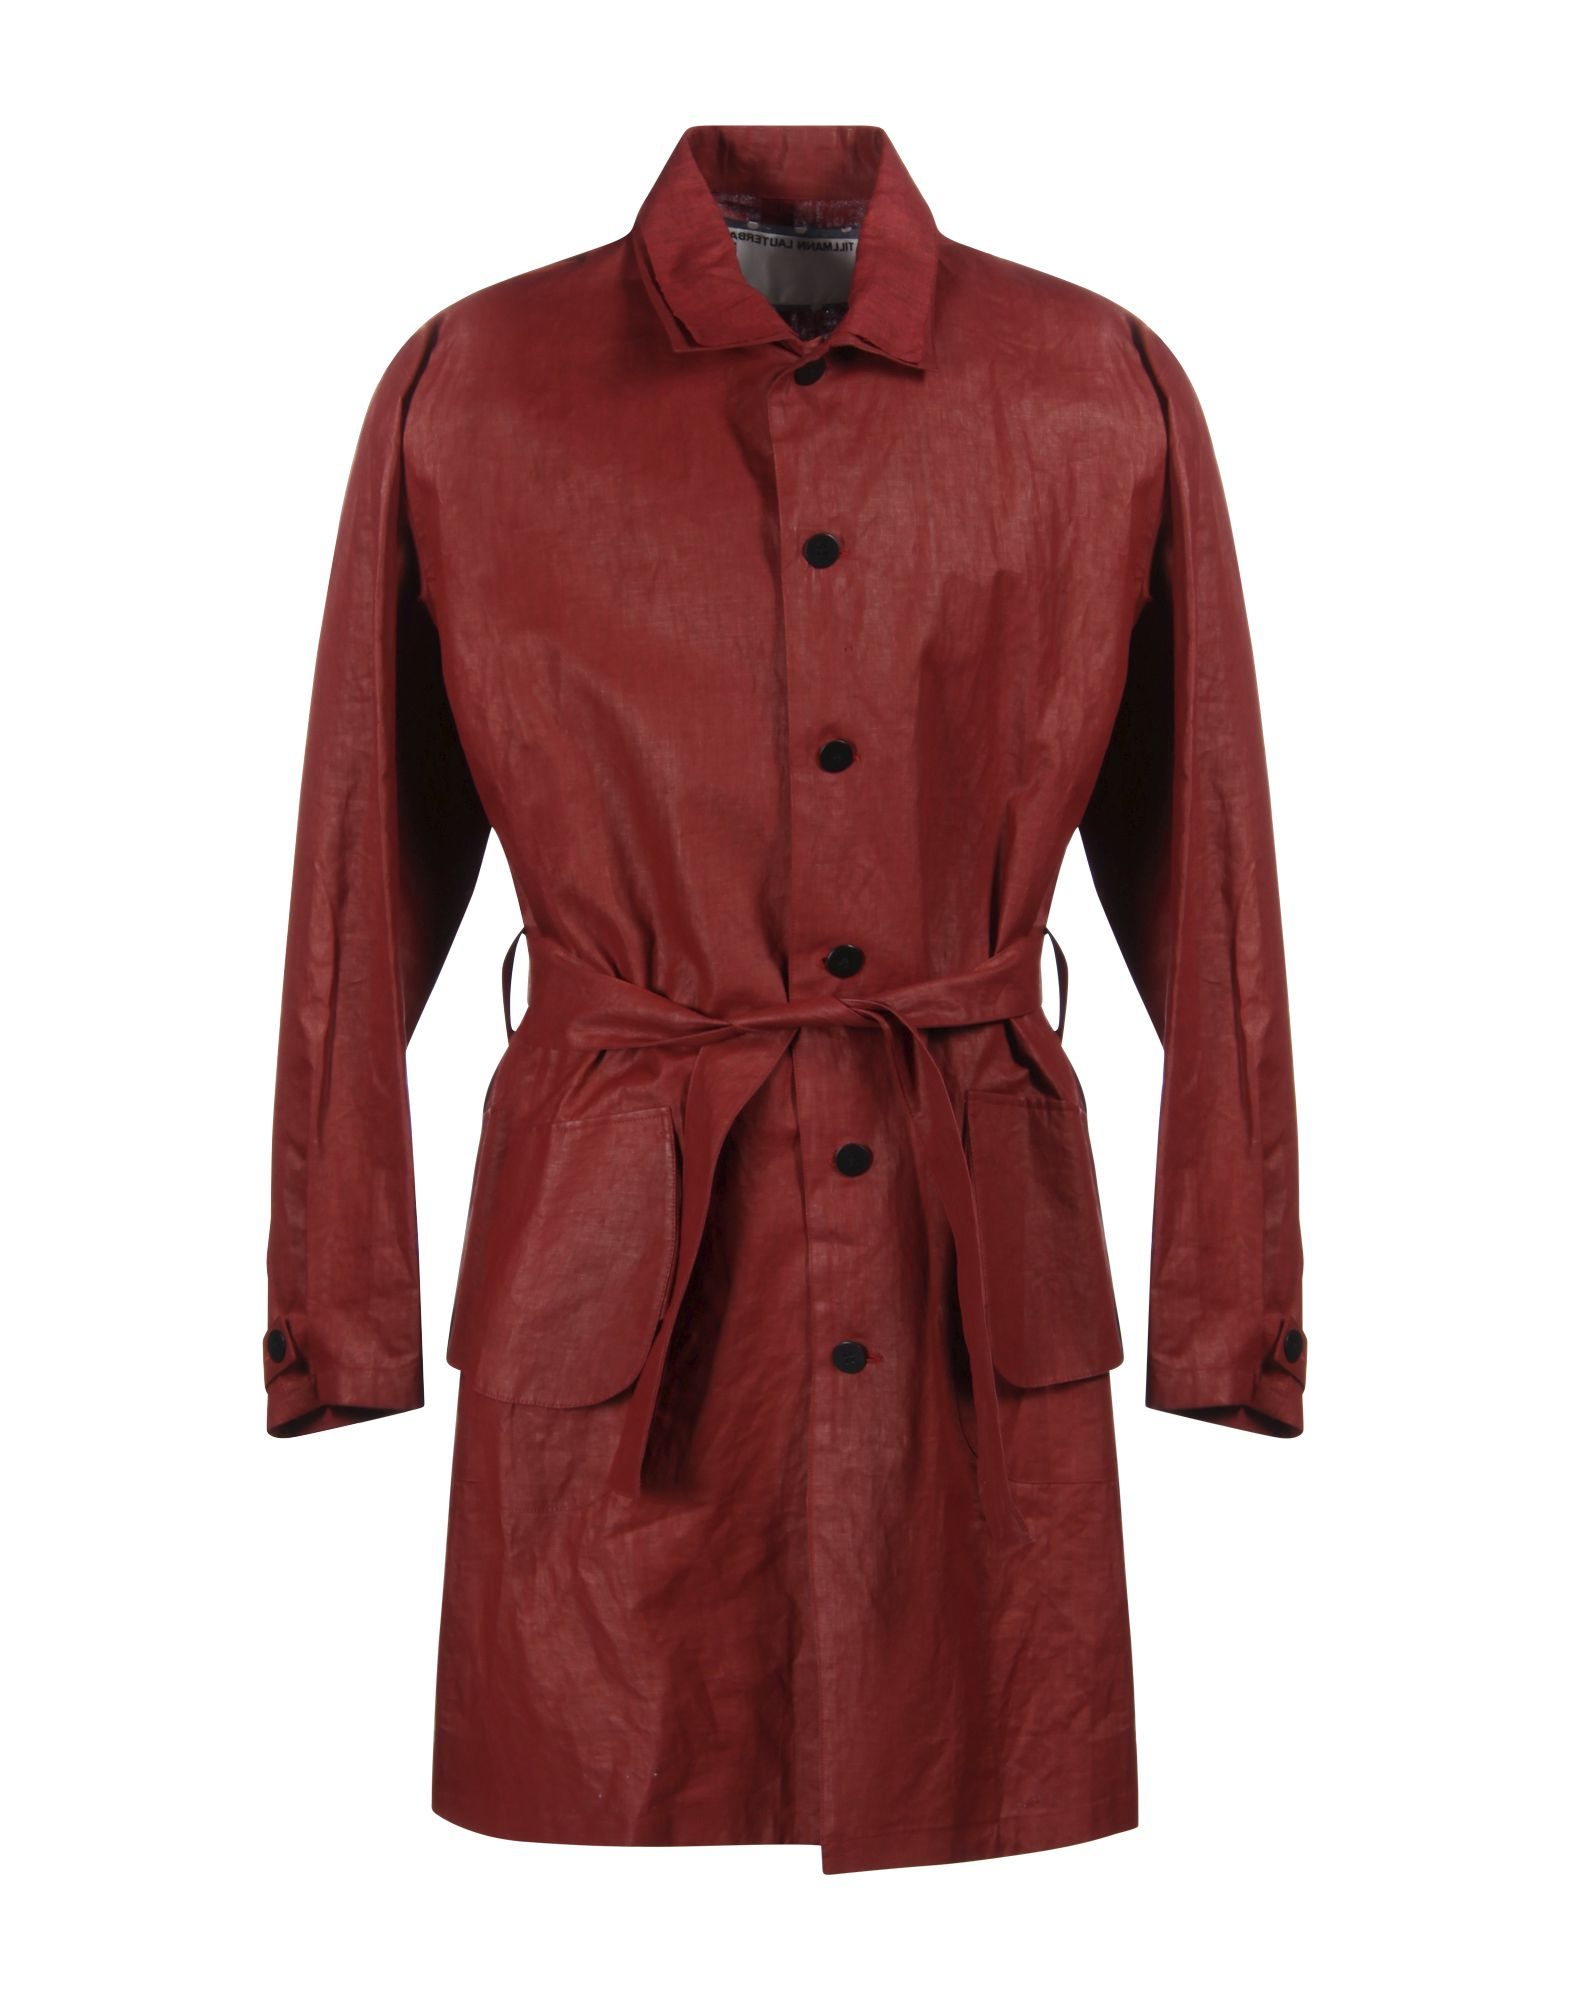 TILLMANN LAUTERBACH Full-Length Jacket in Red